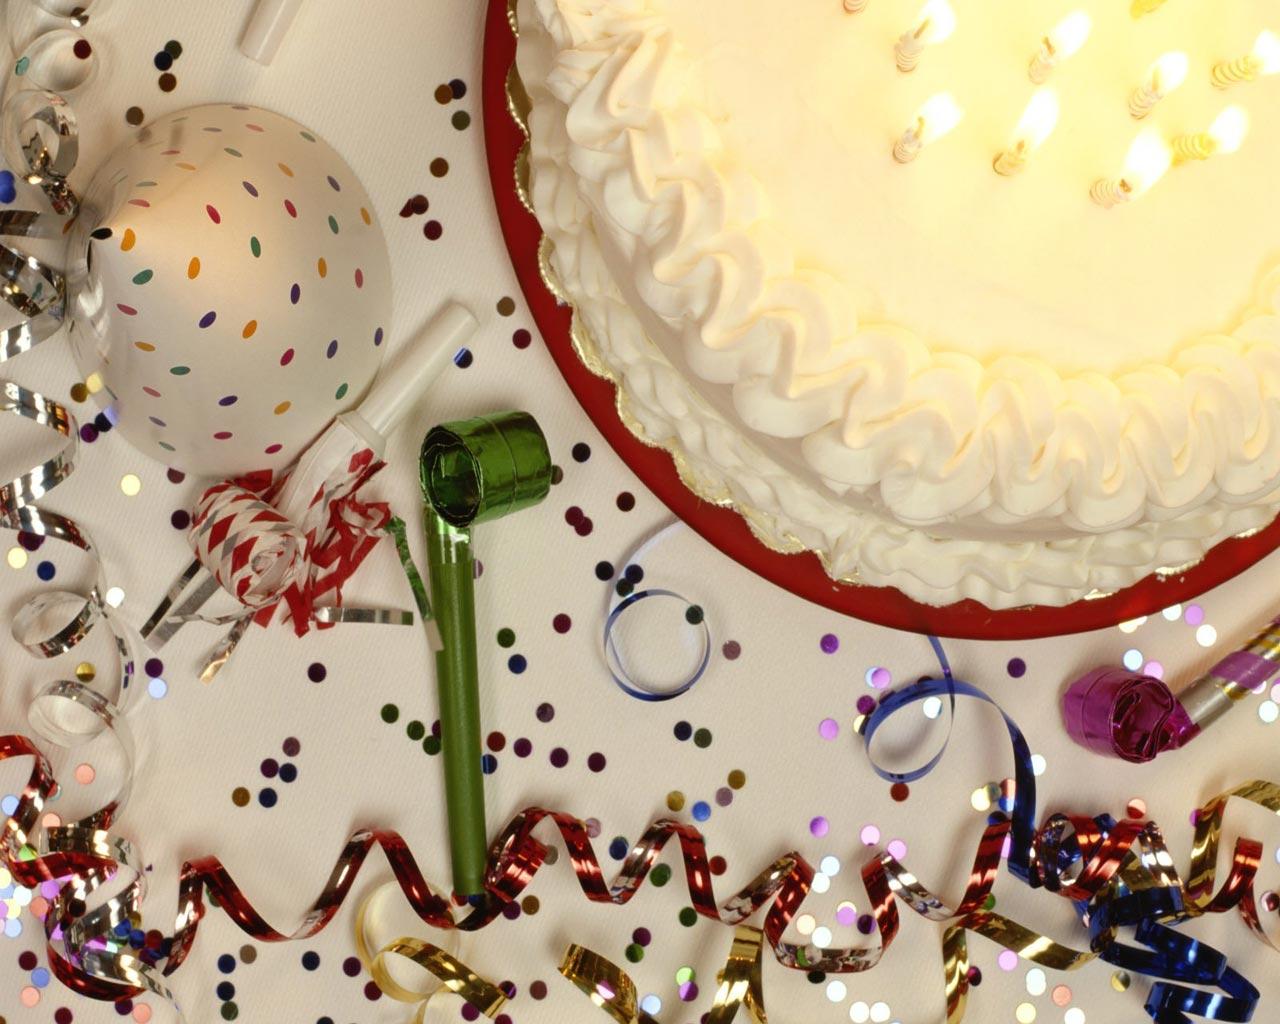 http://2.bp.blogspot.com/-4qFqUNNqLC4/T2NcO2ygRWI/AAAAAAAABFU/IKeJ_VSrPm0/s1600/festa_de_aniversario_wallpaper-40255.jpg